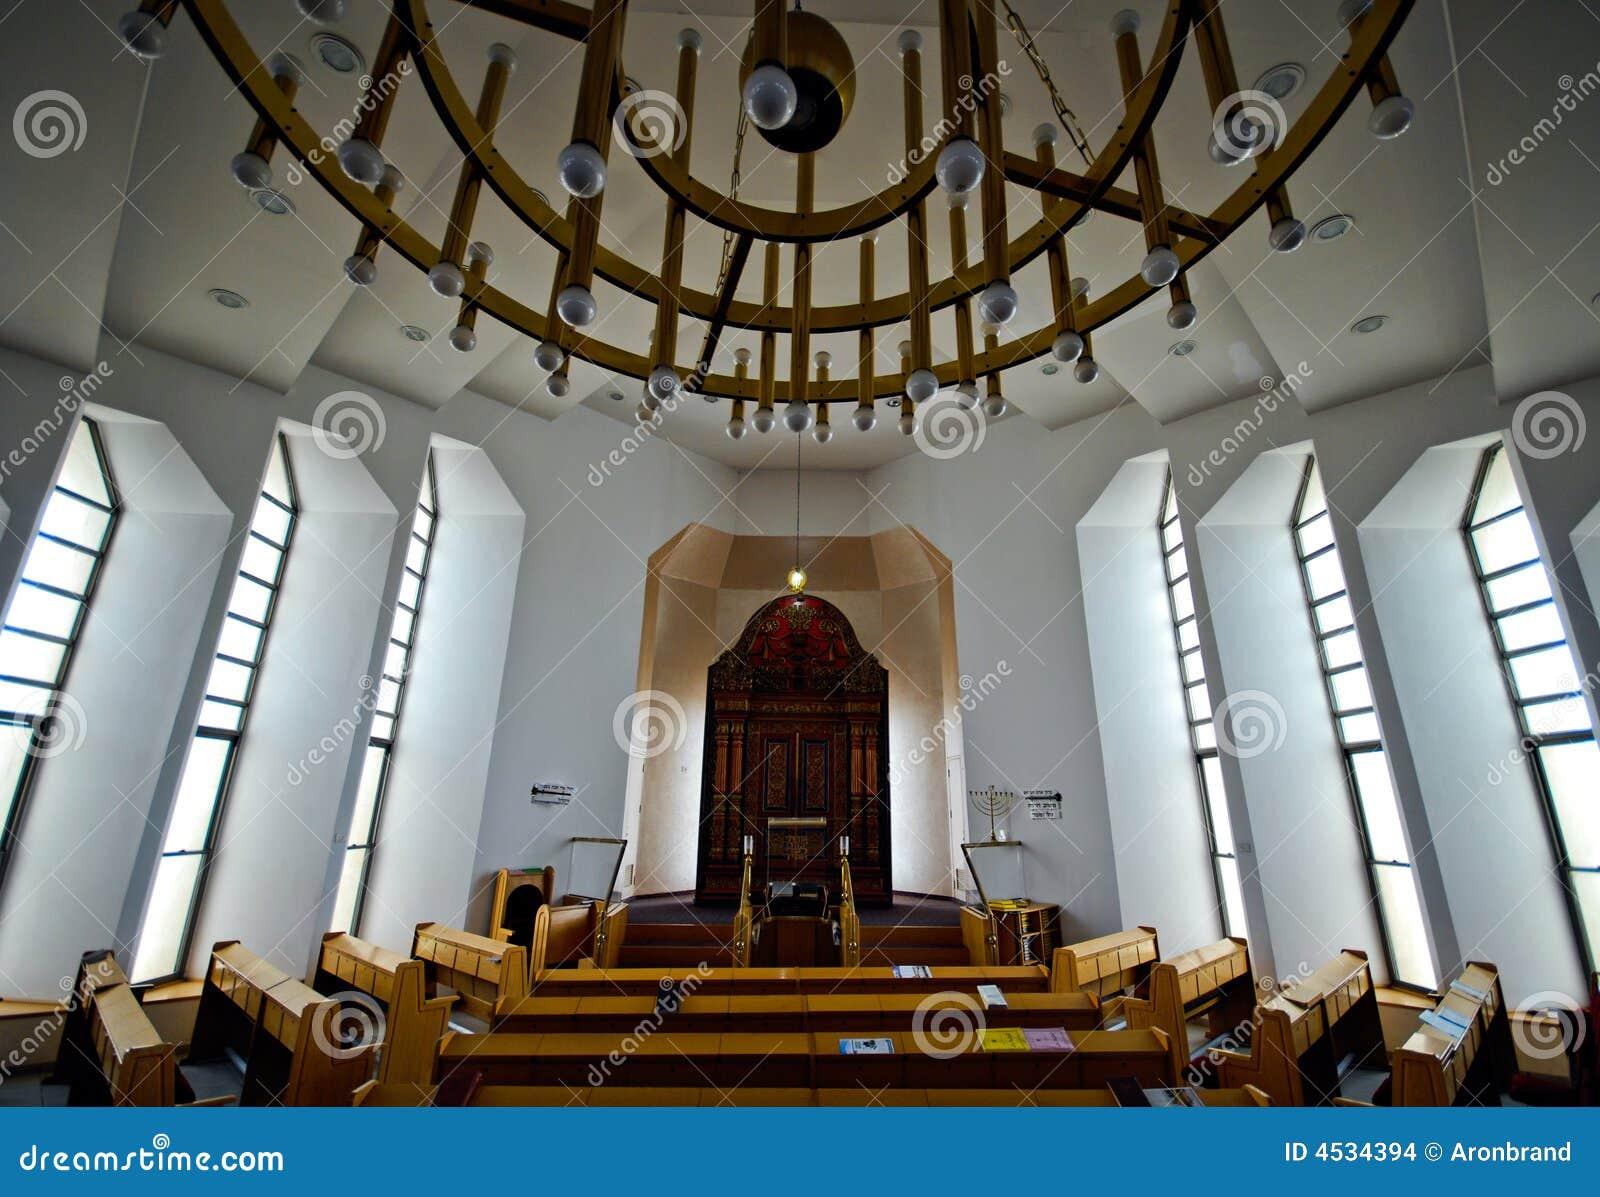 Israel nechalimsynagoga